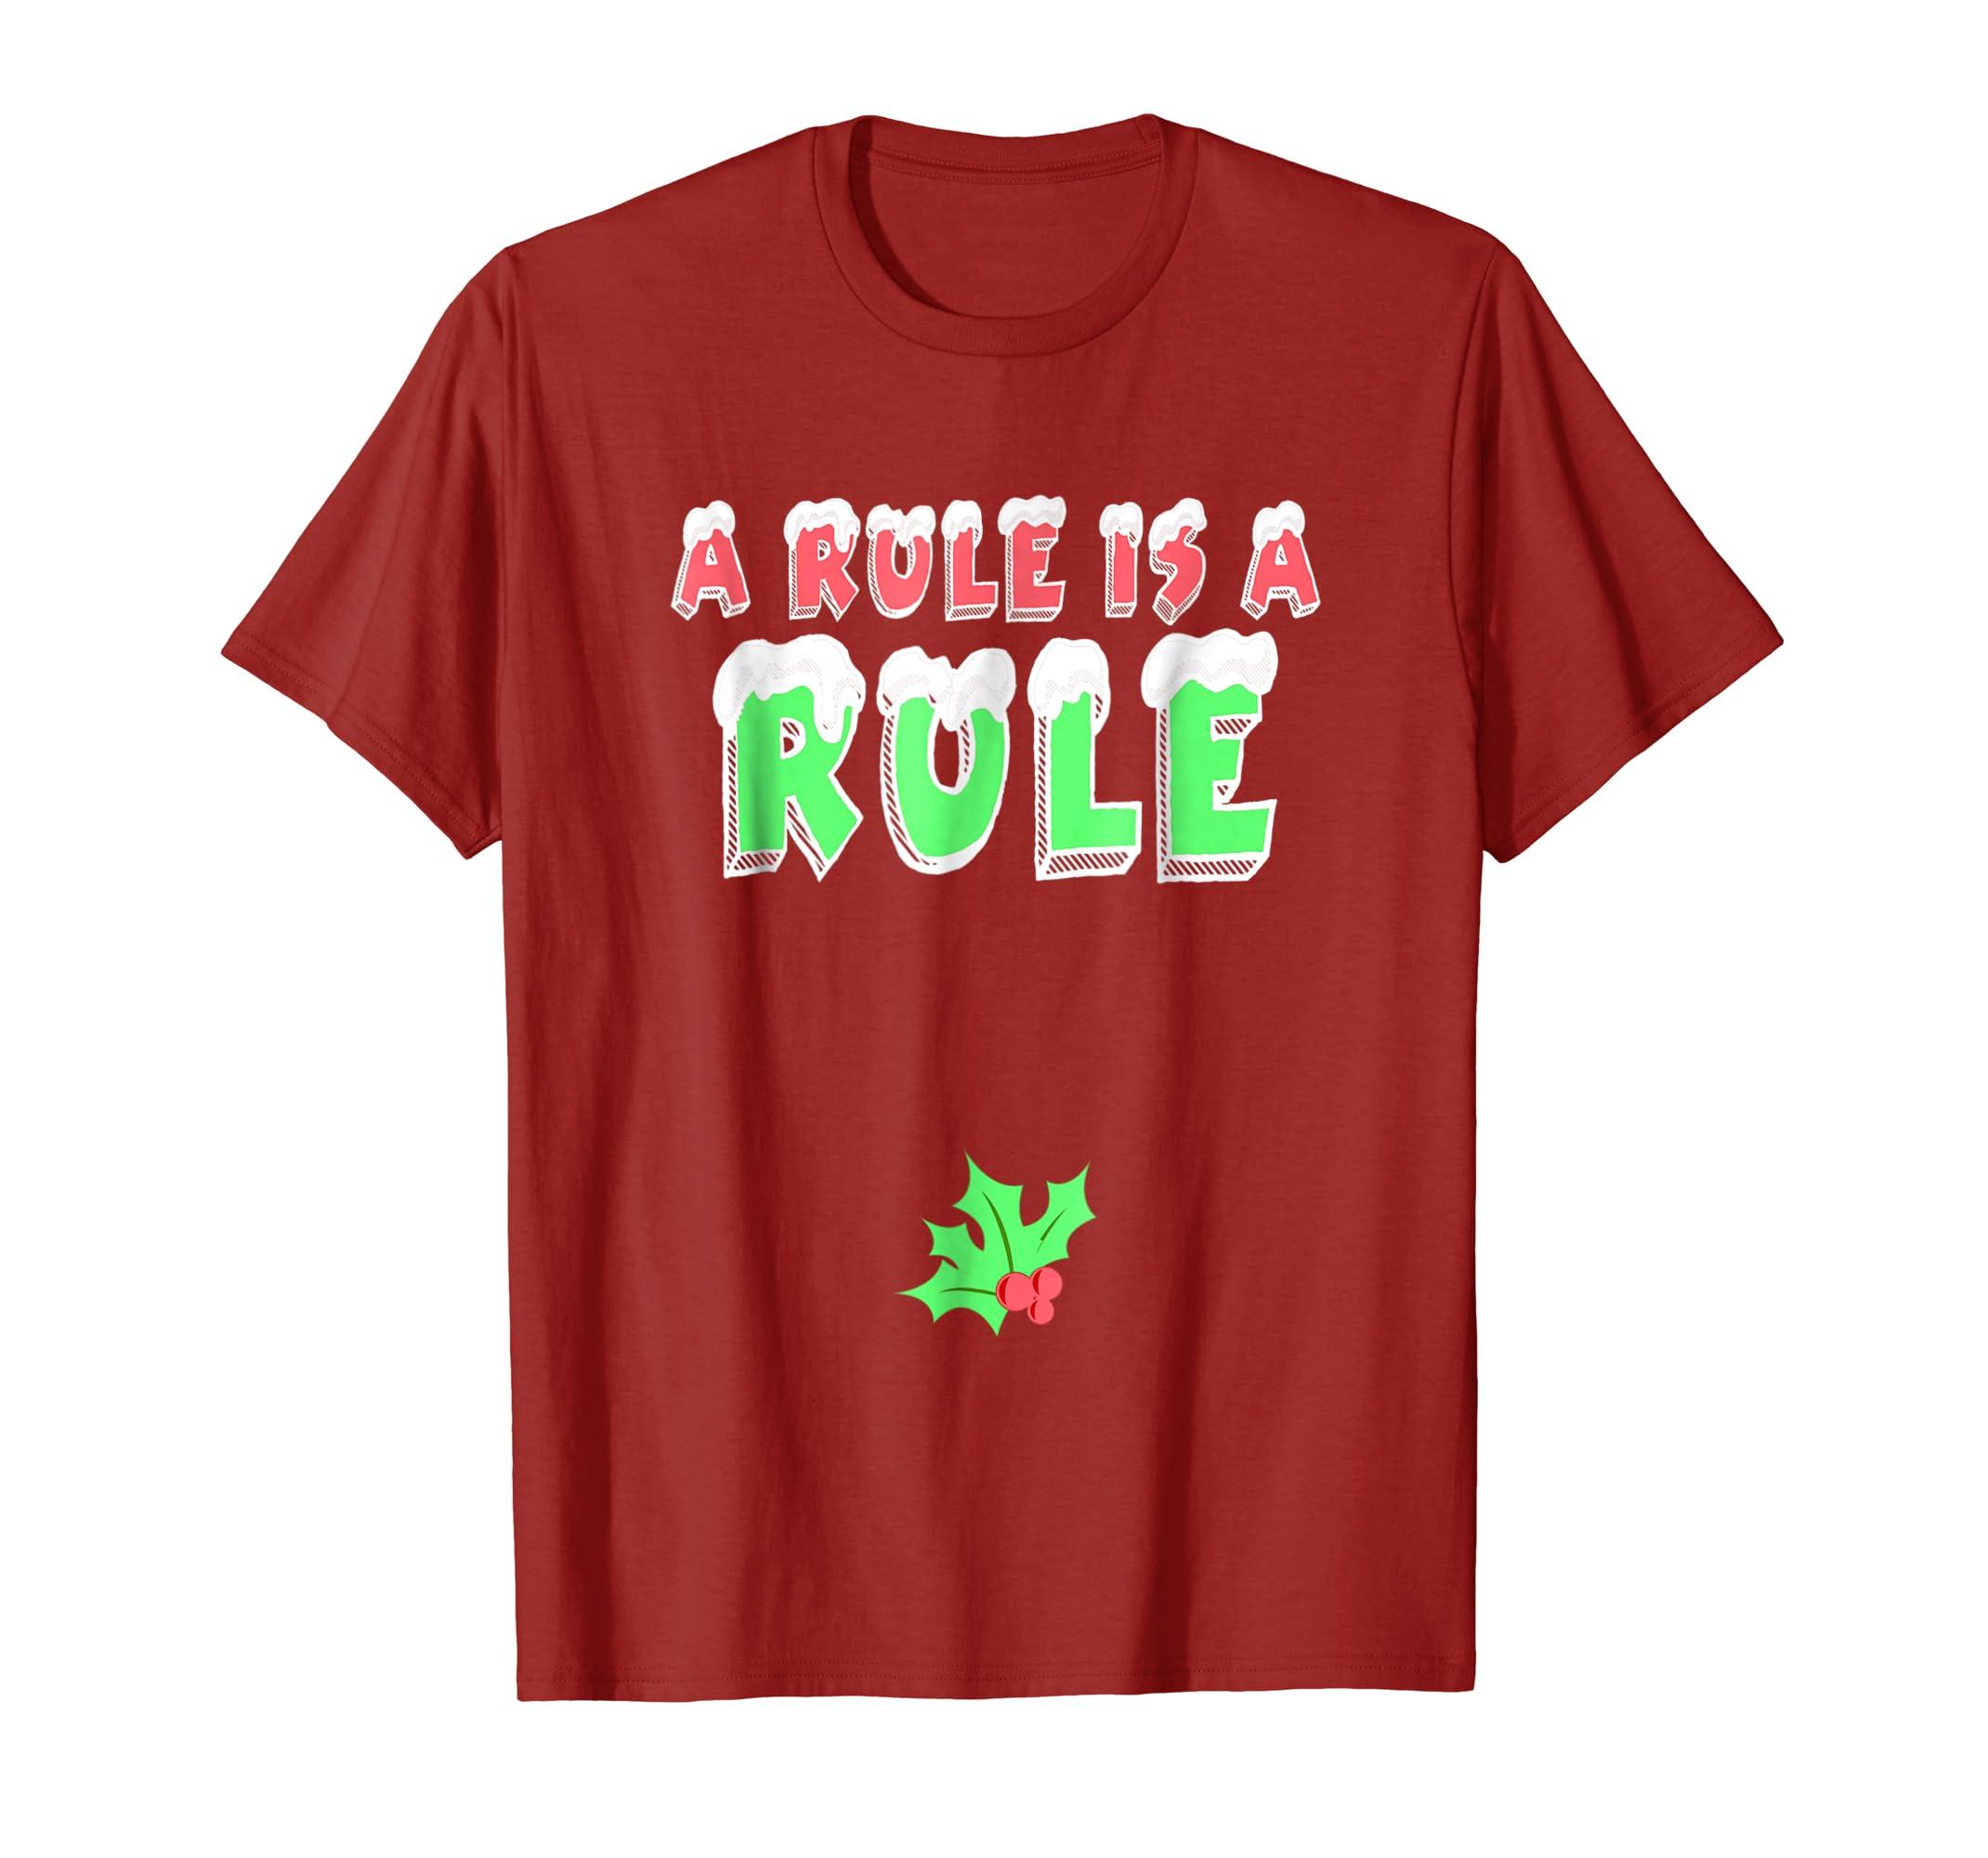 04e3402f Amazon.com: A Rule Is A Rule Funny Mistletoe Shirt | Dirty Christmas Tee:  Clothing